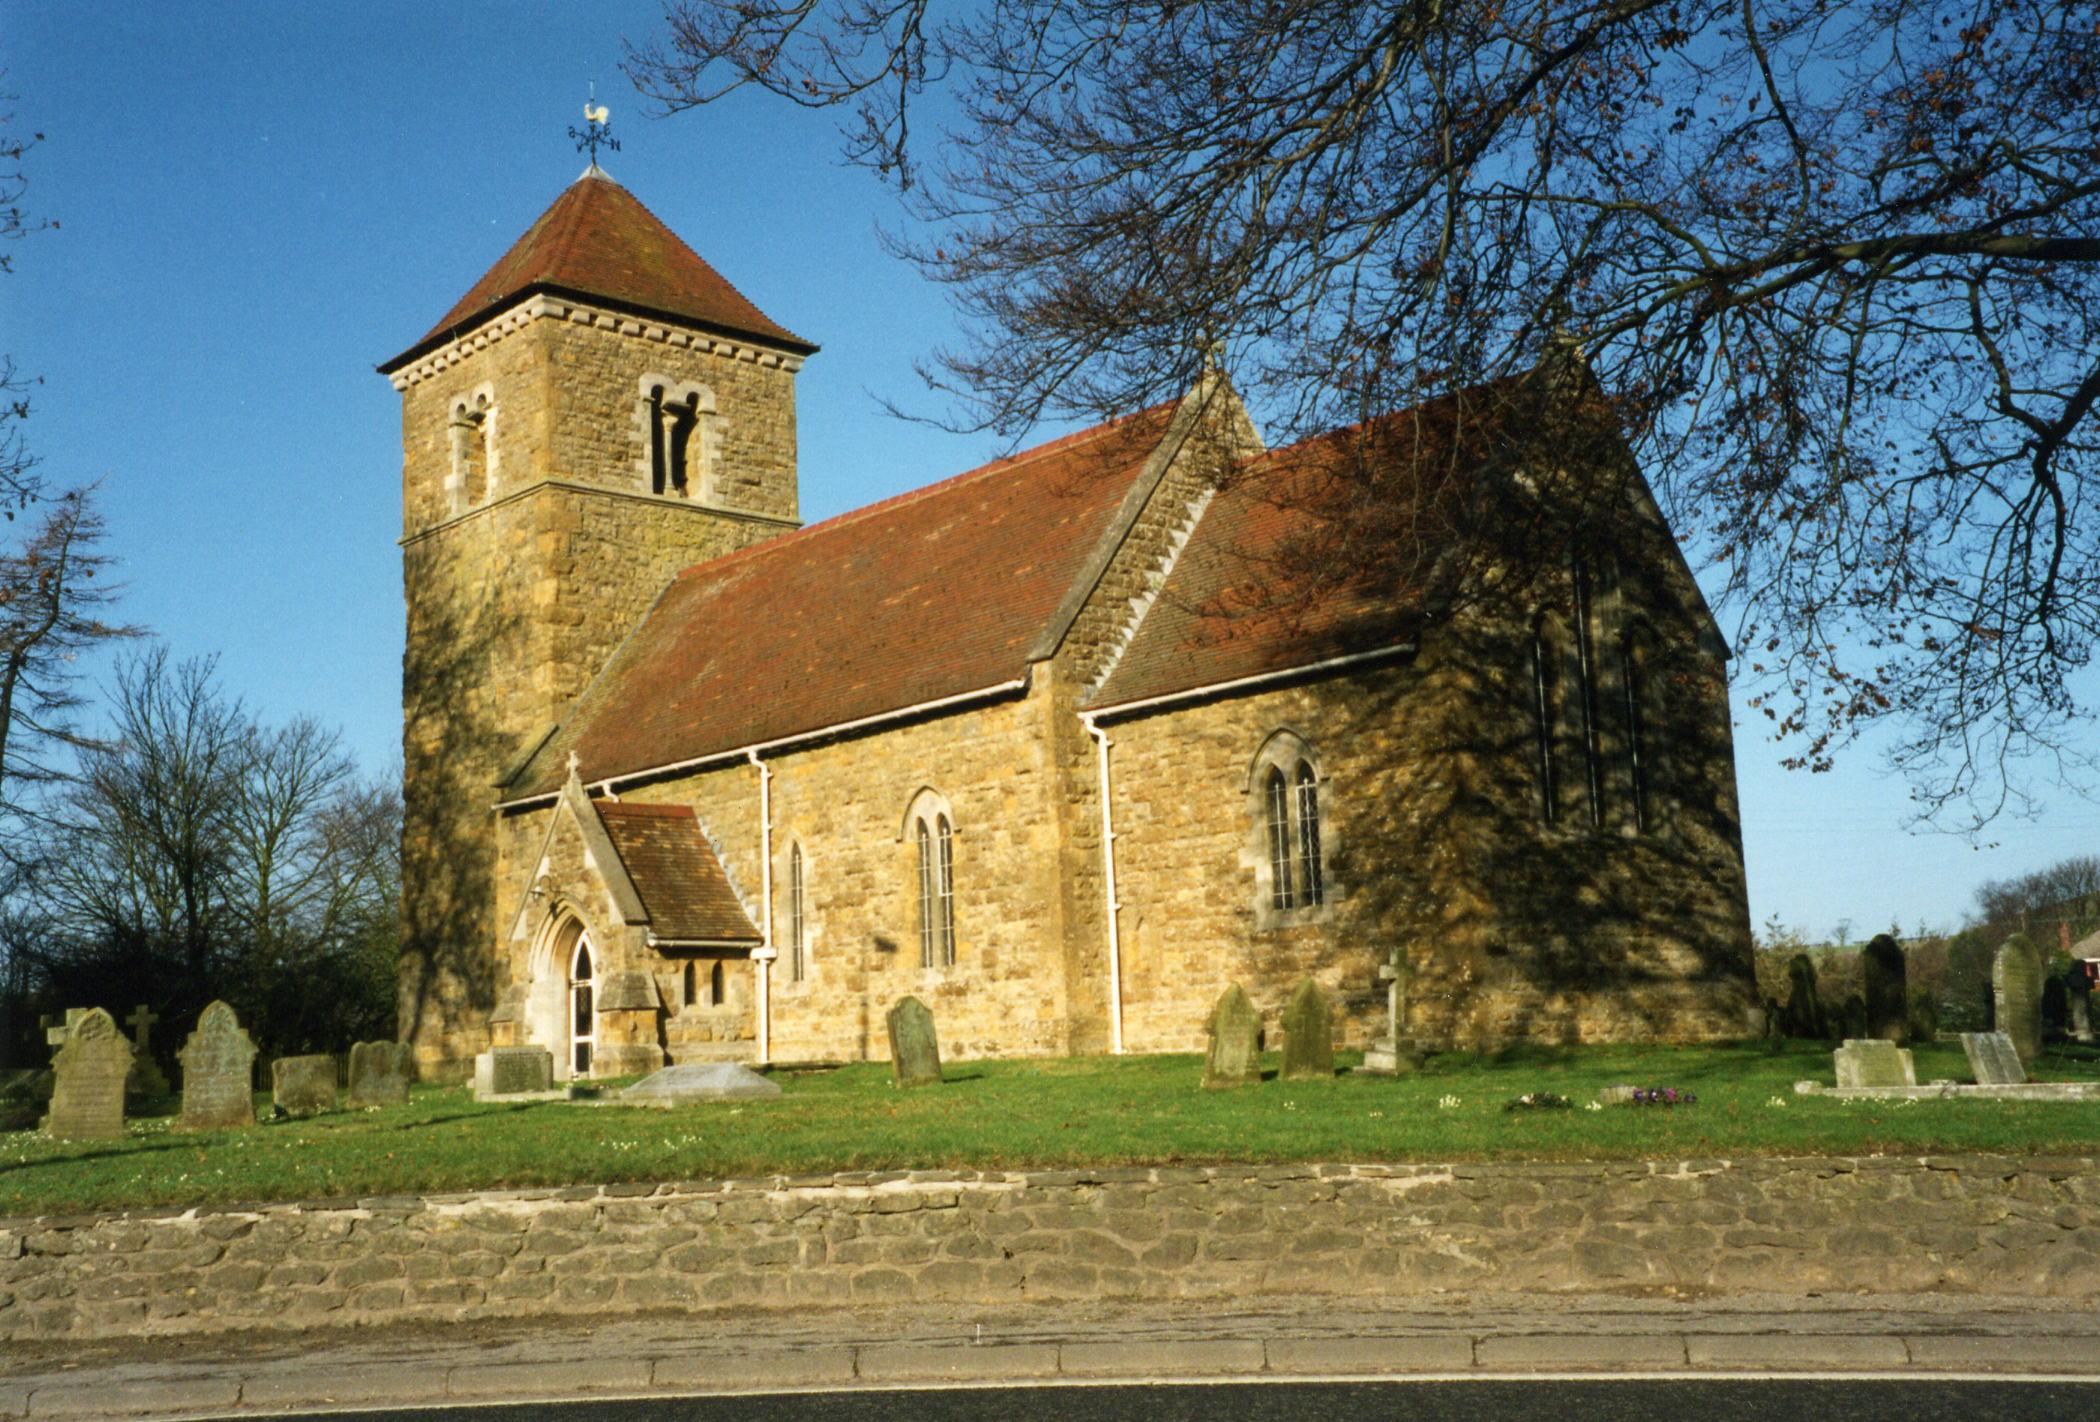 Cabourne St. Nicholas parish church